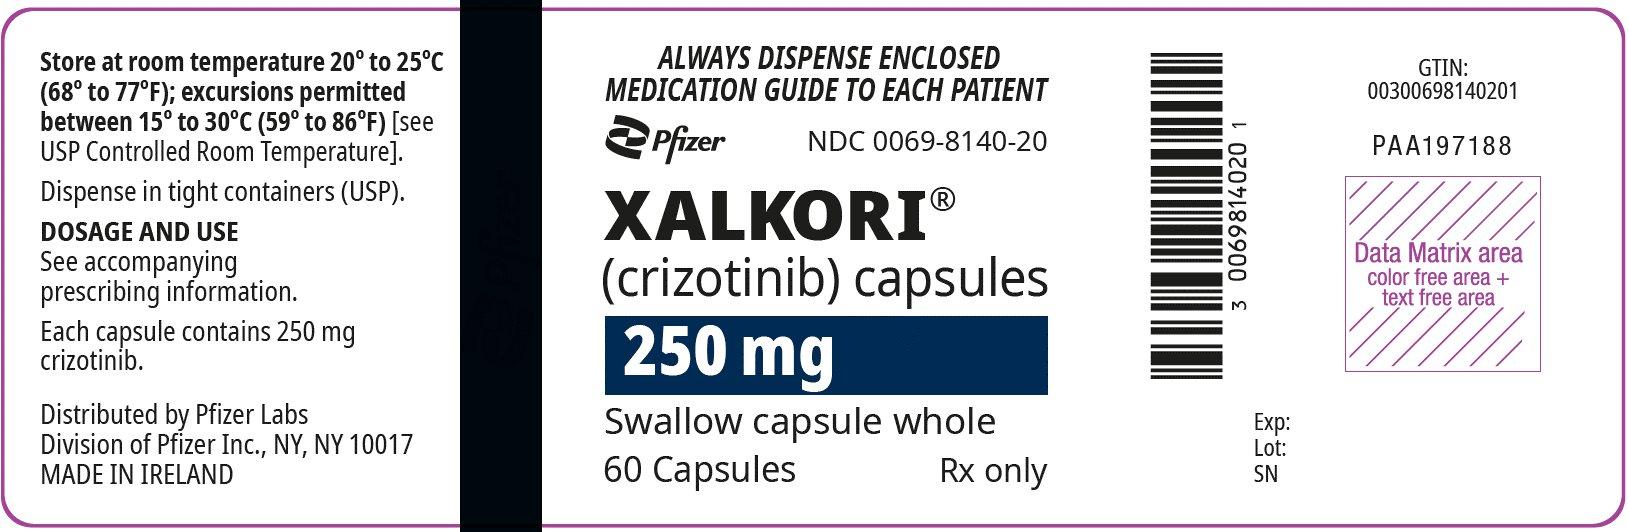 PRINCIPAL DISPLAY PANEL - 200 mg Capsule Bottle Label